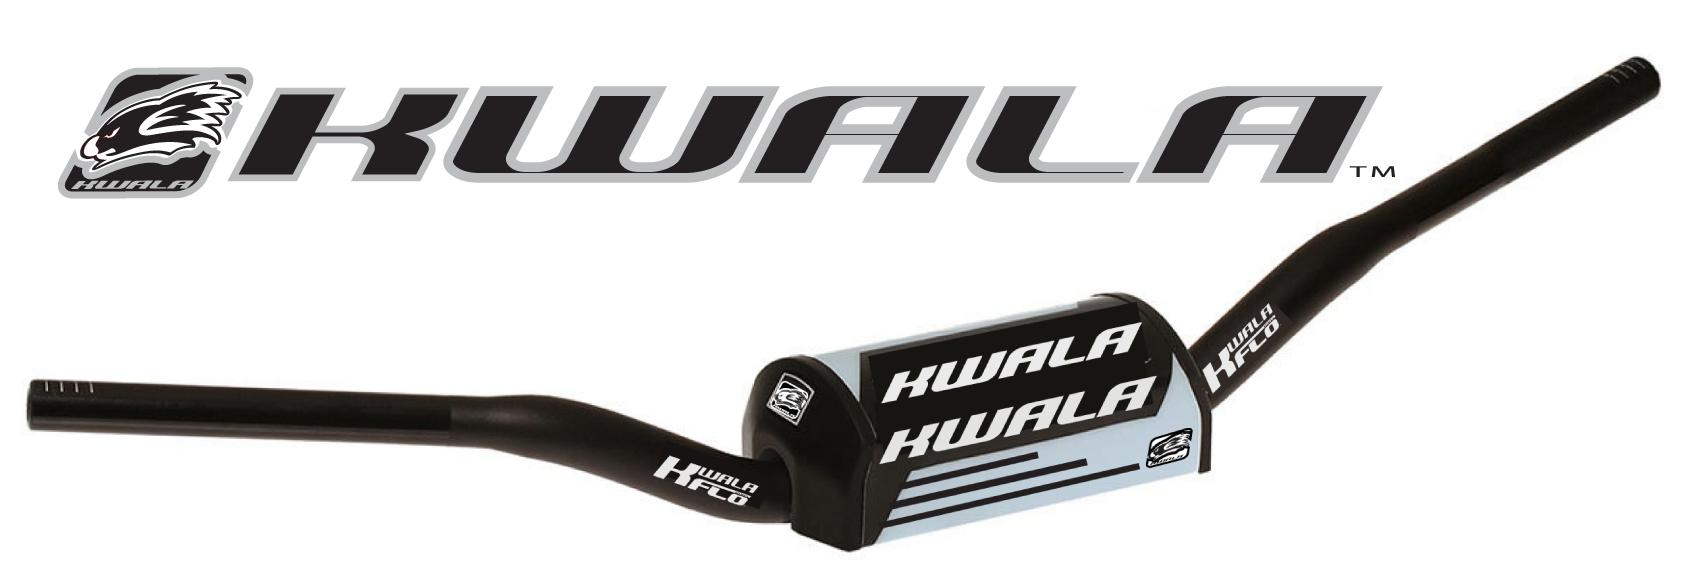 kwala-flo-1-o-handlebar-bar-pad-disp-artwork-ad-1.png